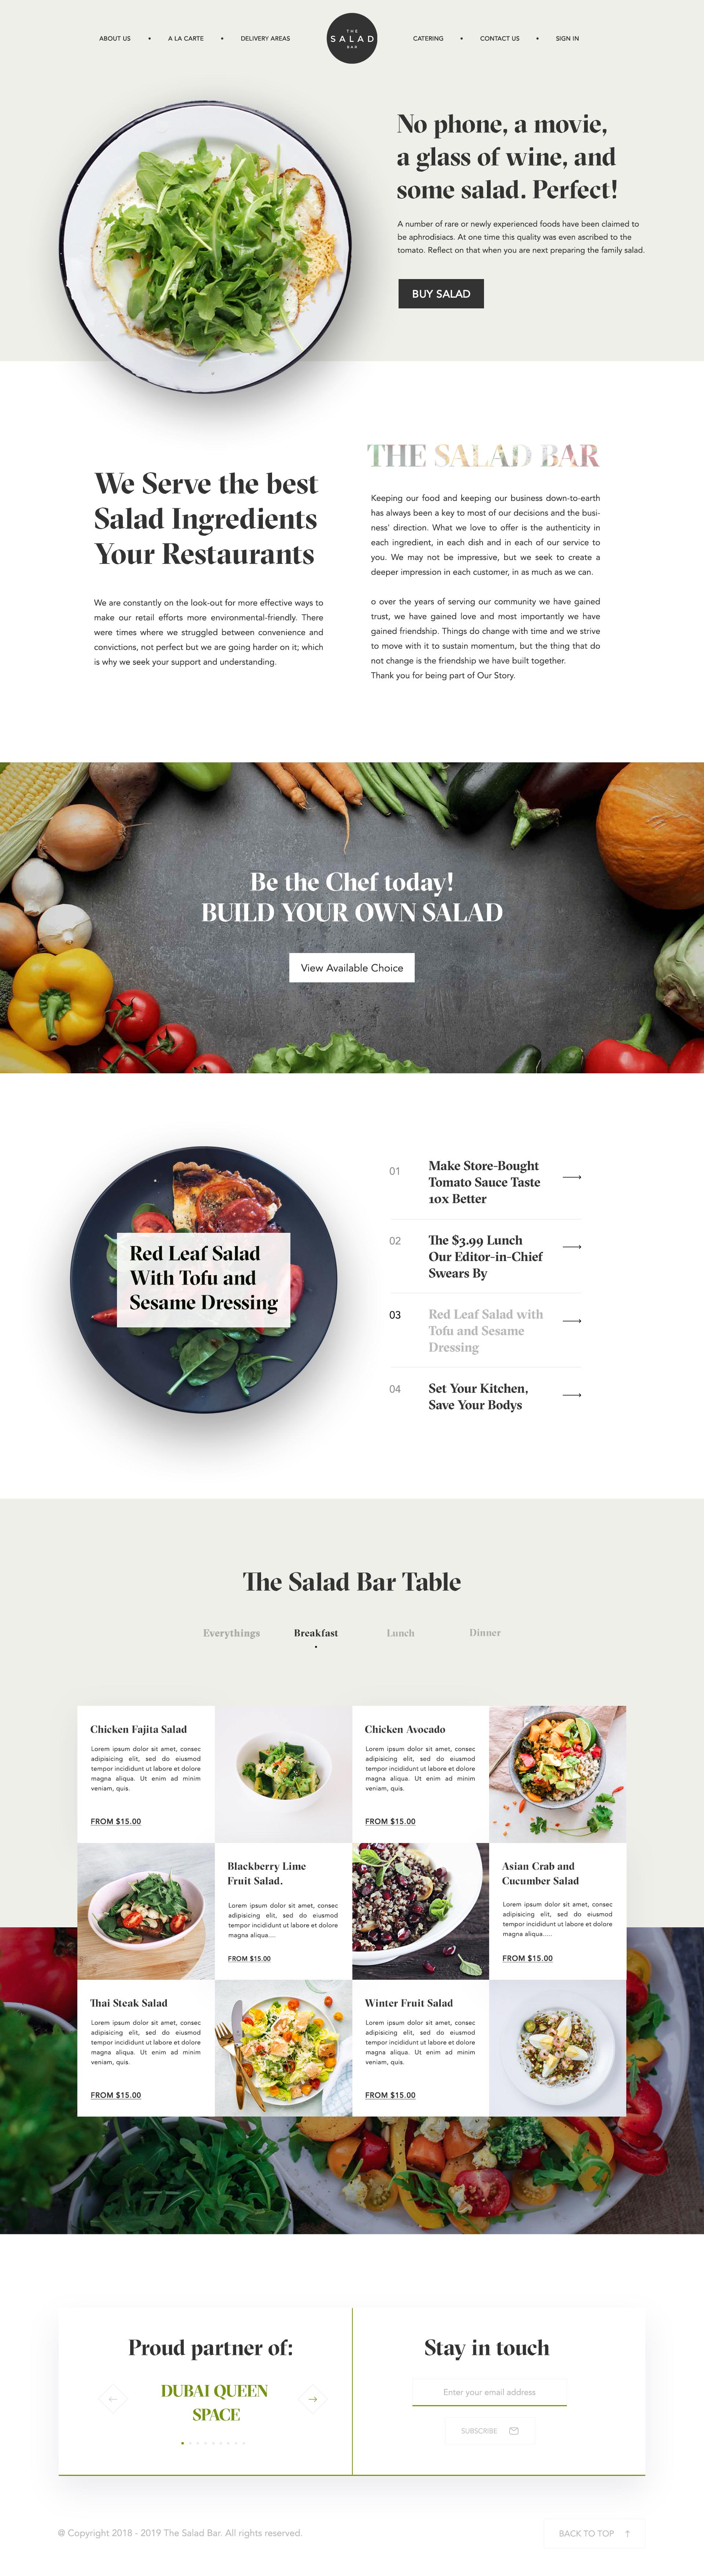 The salad bar homepage design